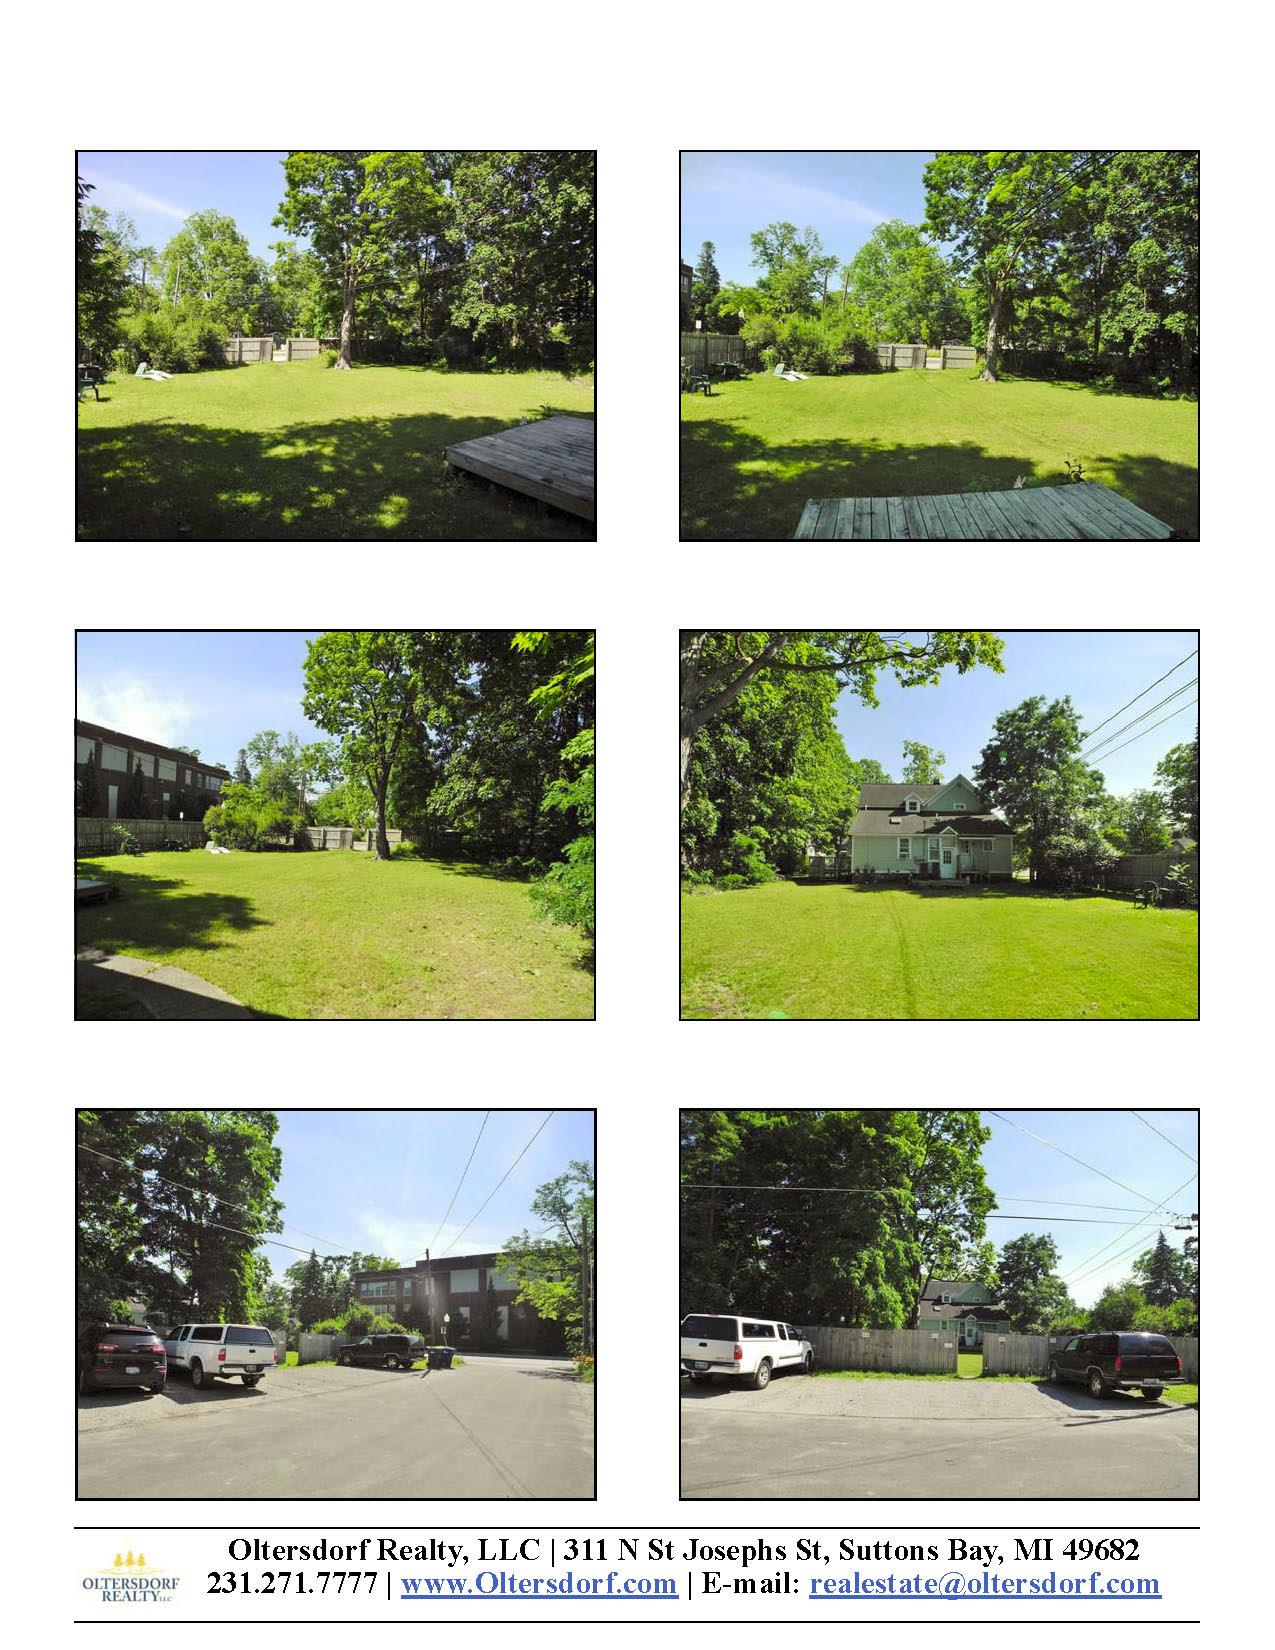 224 W Eighth St, Traverse City, MI – Downtown Traverse City Triplex Marketing Packet - For sale by Oltersdorf Realty LLC (4).jpg